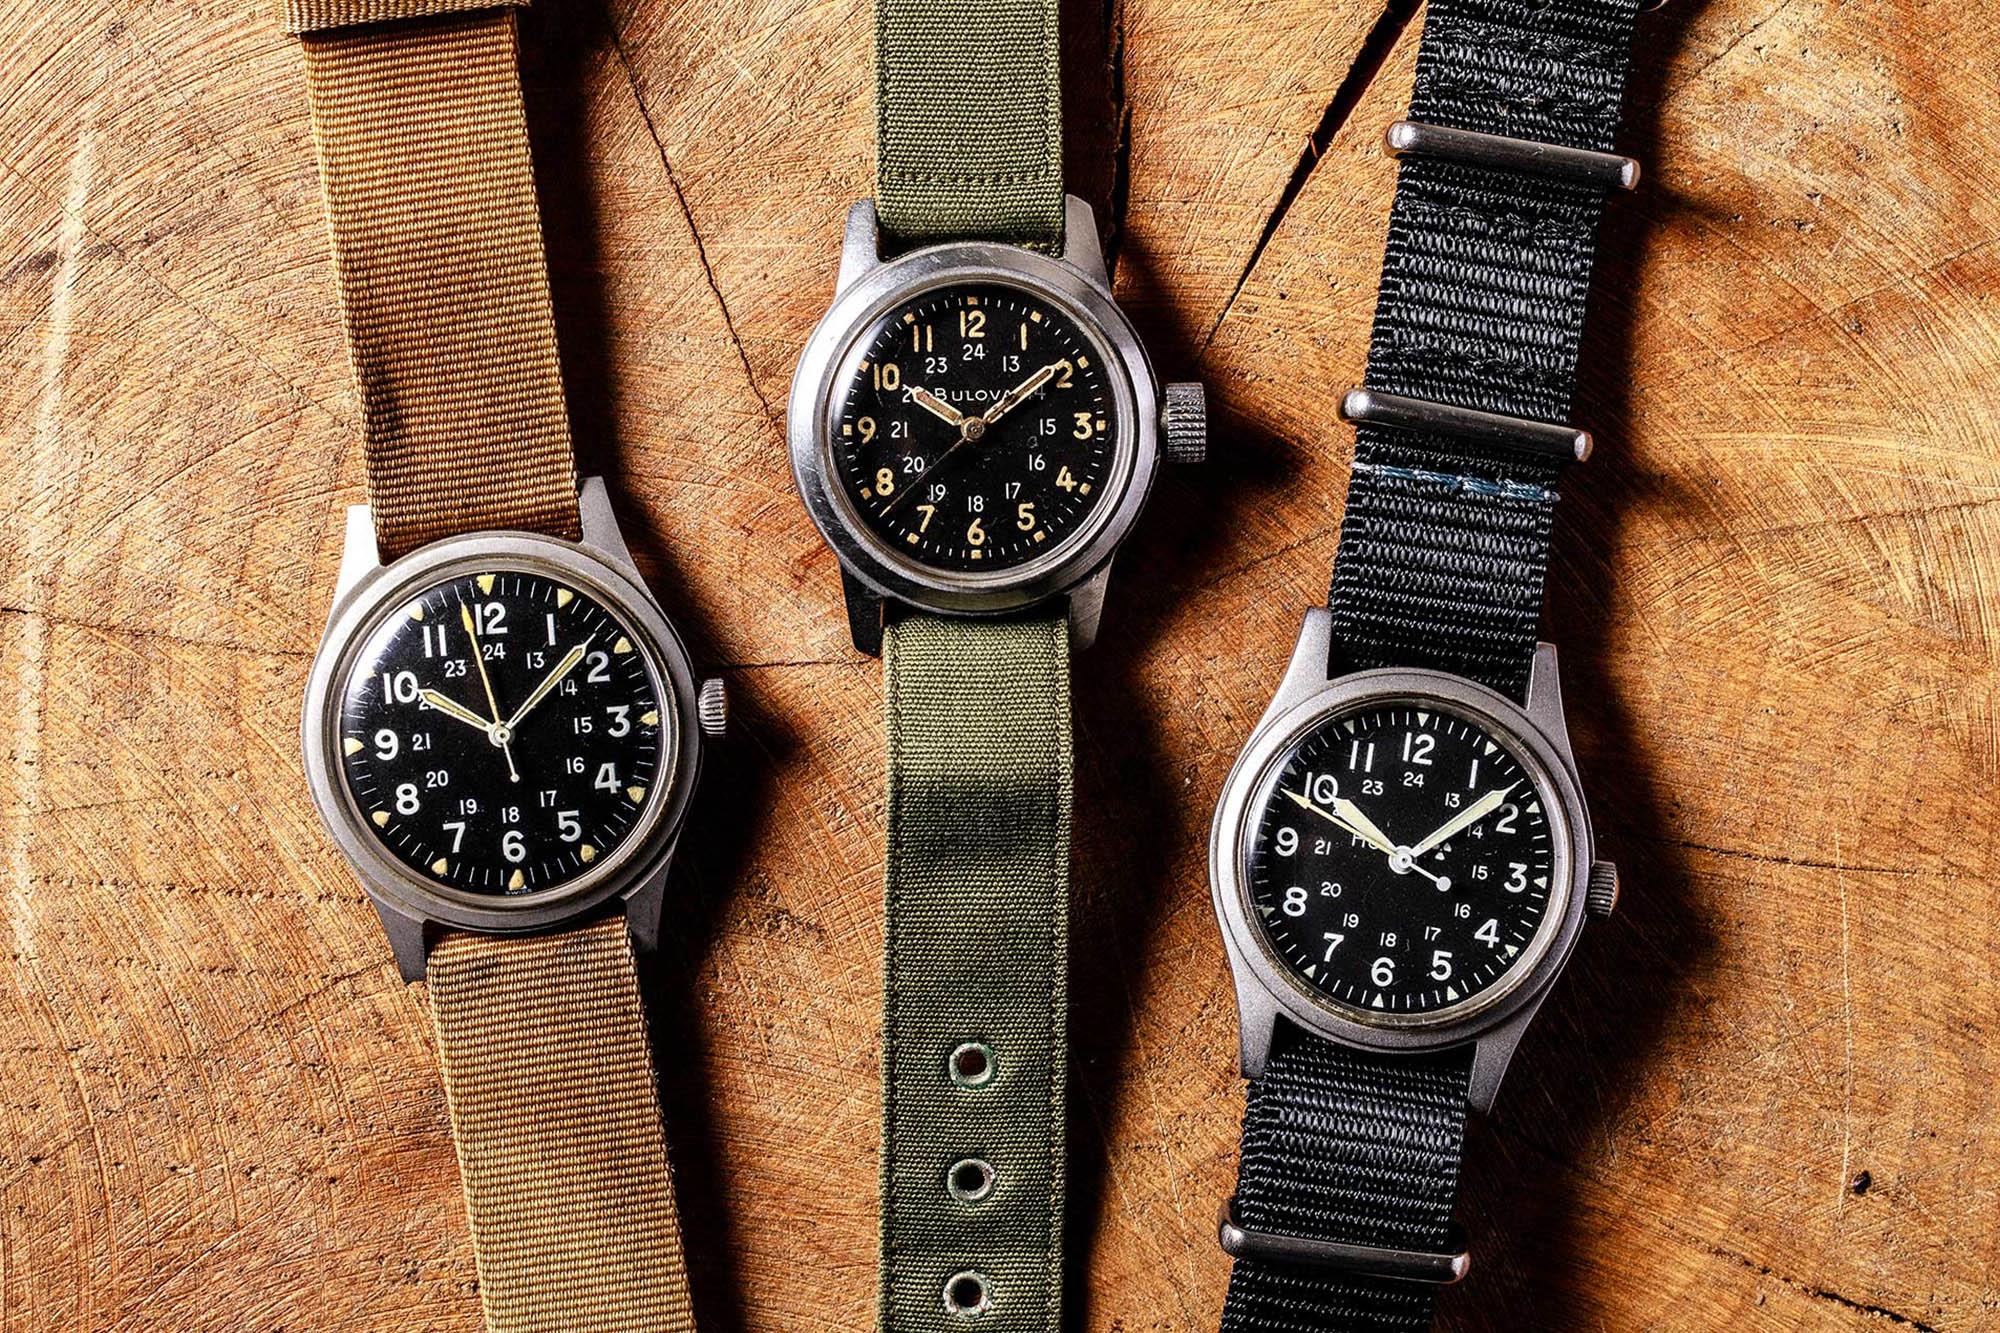 Military watches - Benrus à droite